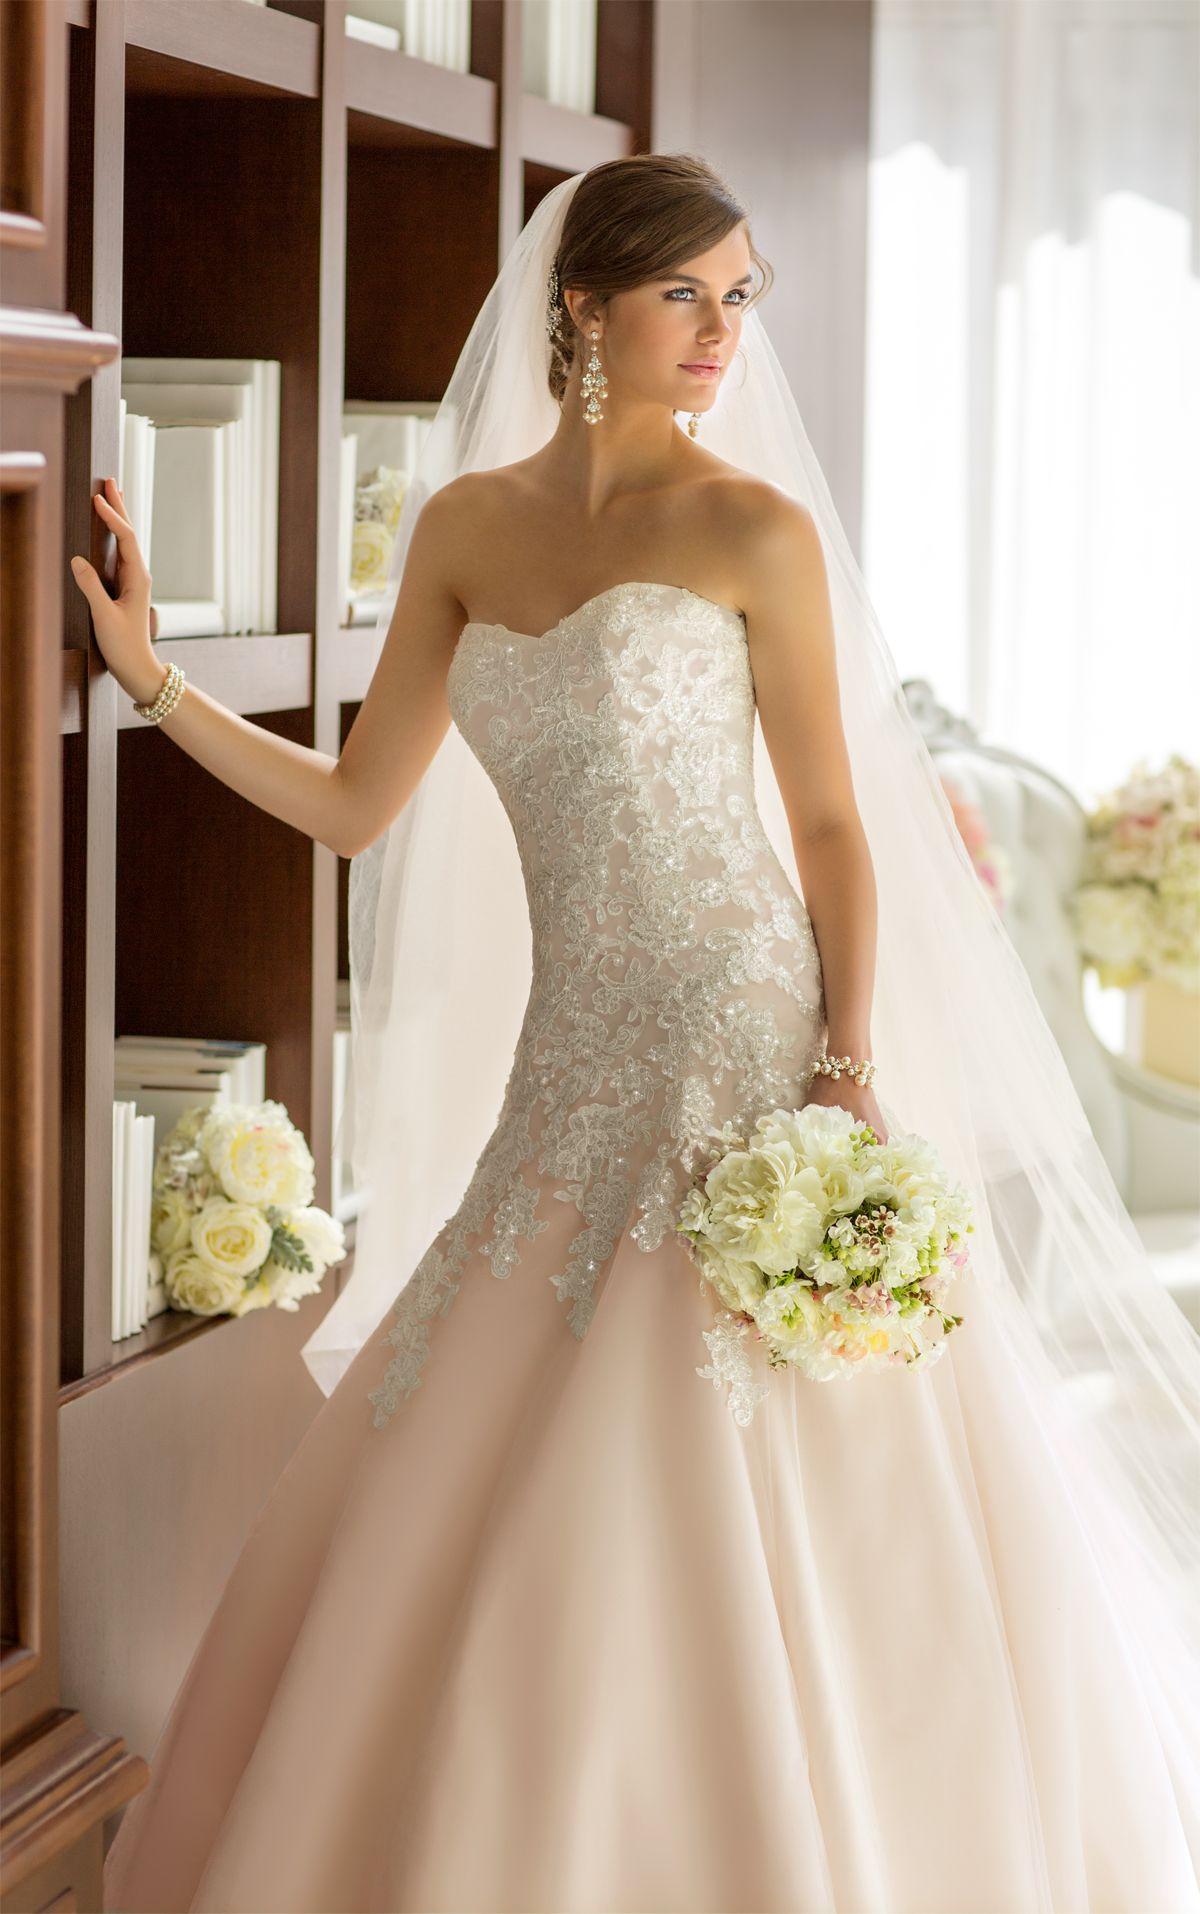 This elegant essense of australia beaded wedding dress features